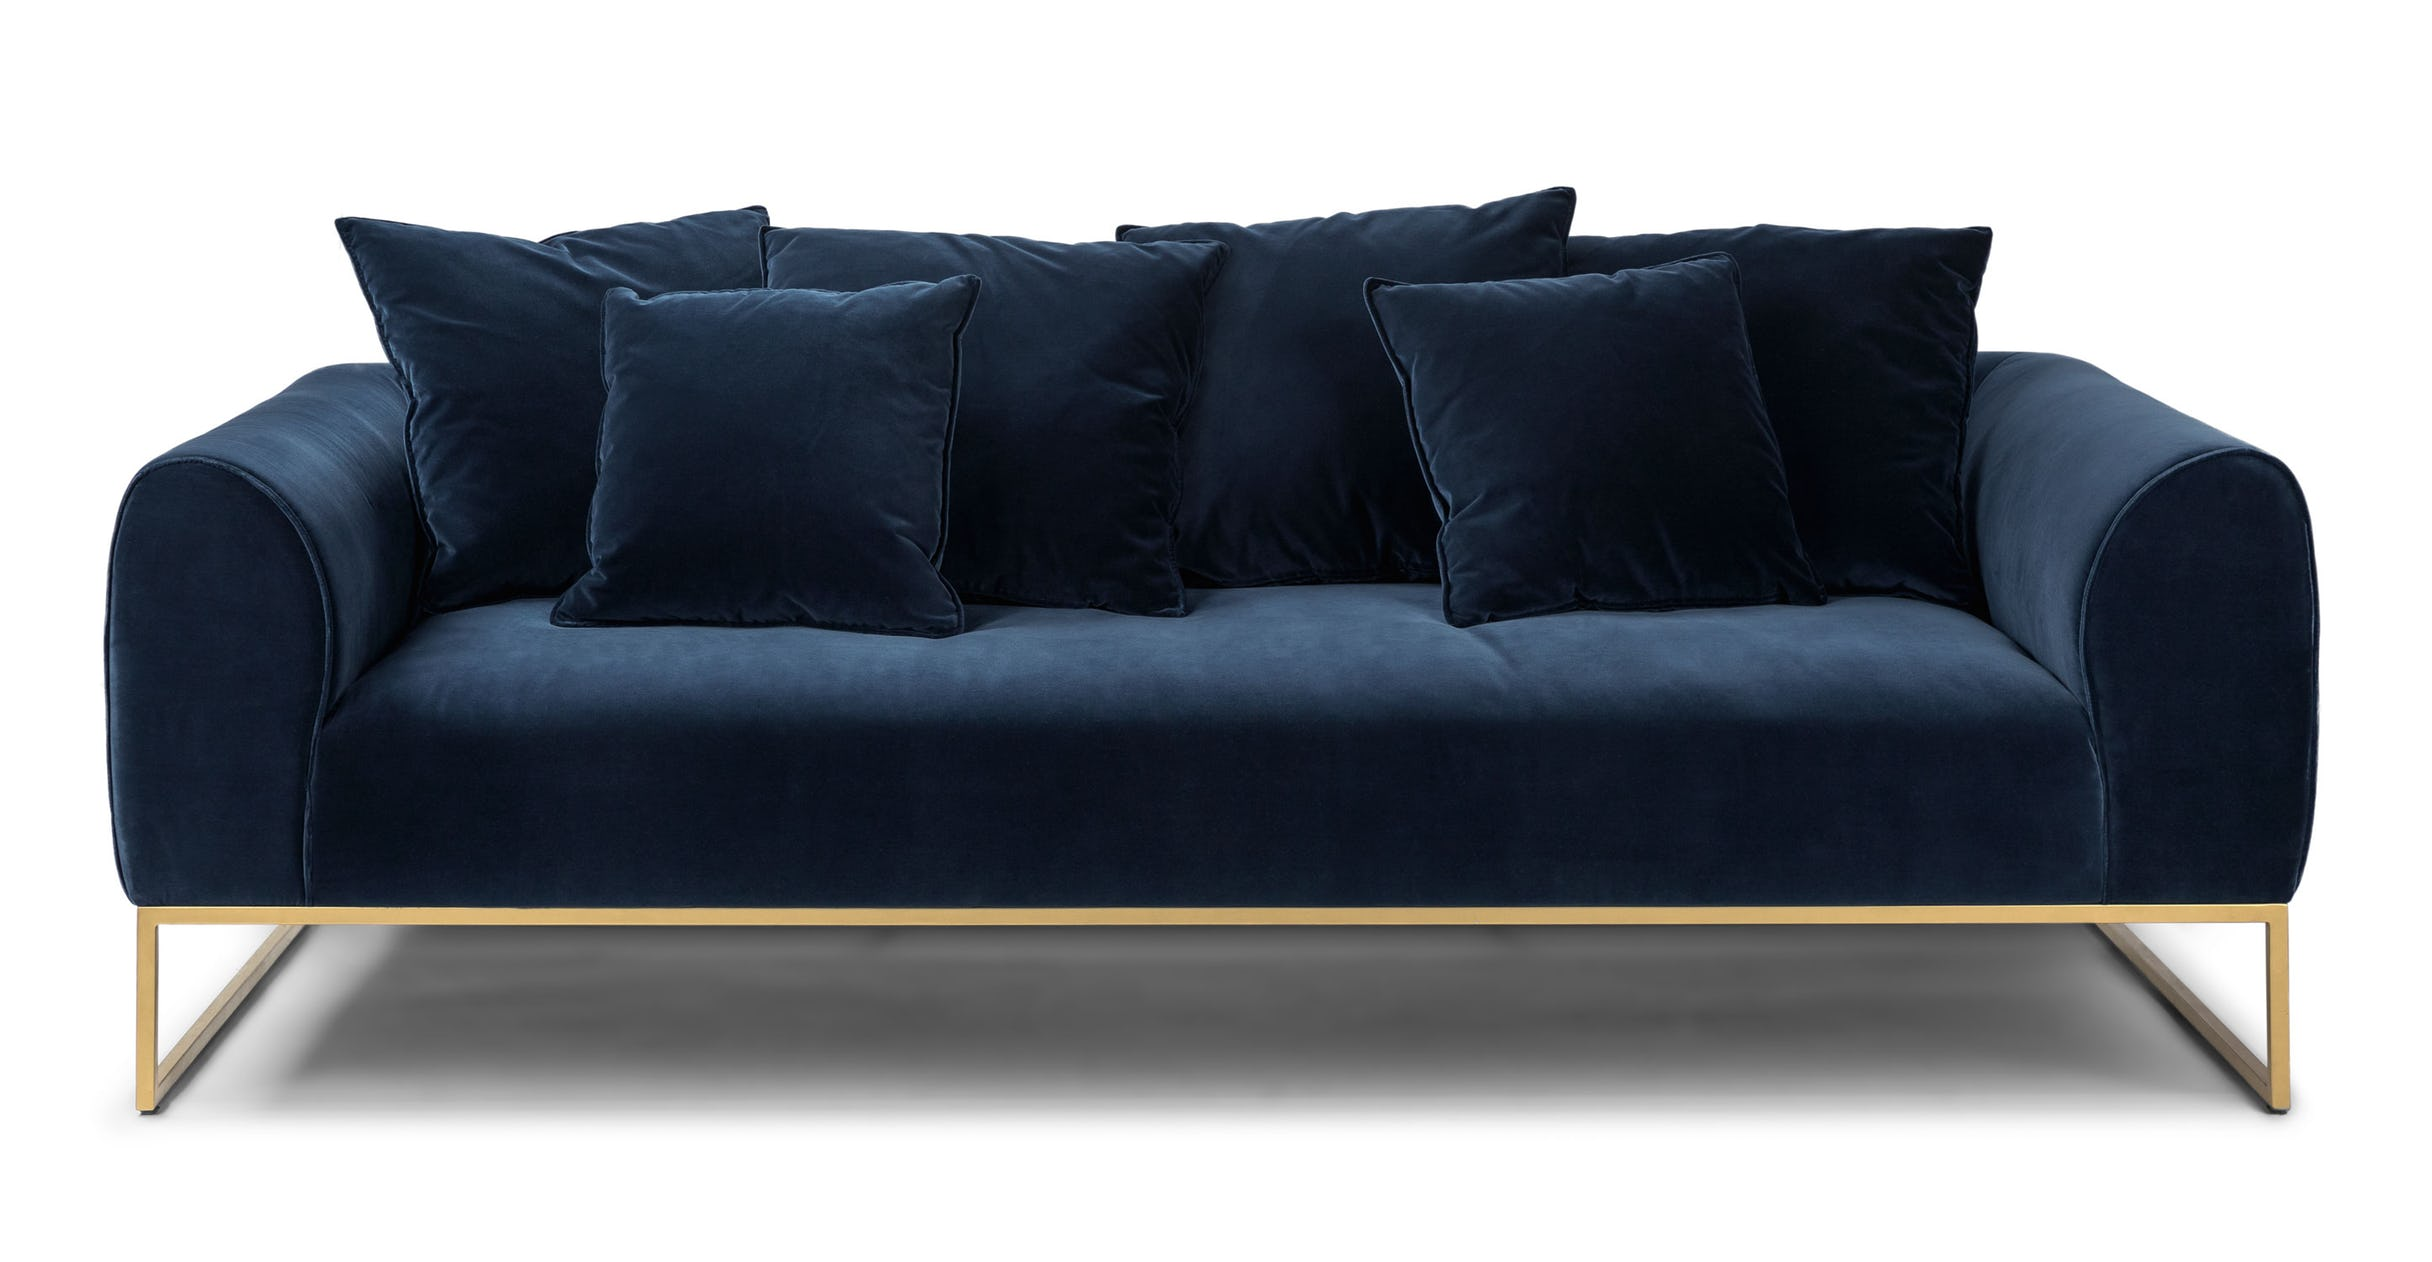 Kits Cascadia Blue Sofa | Luxury furniture sofa, Mid ... on Cascadia Outdoor Living Spaces id=22484